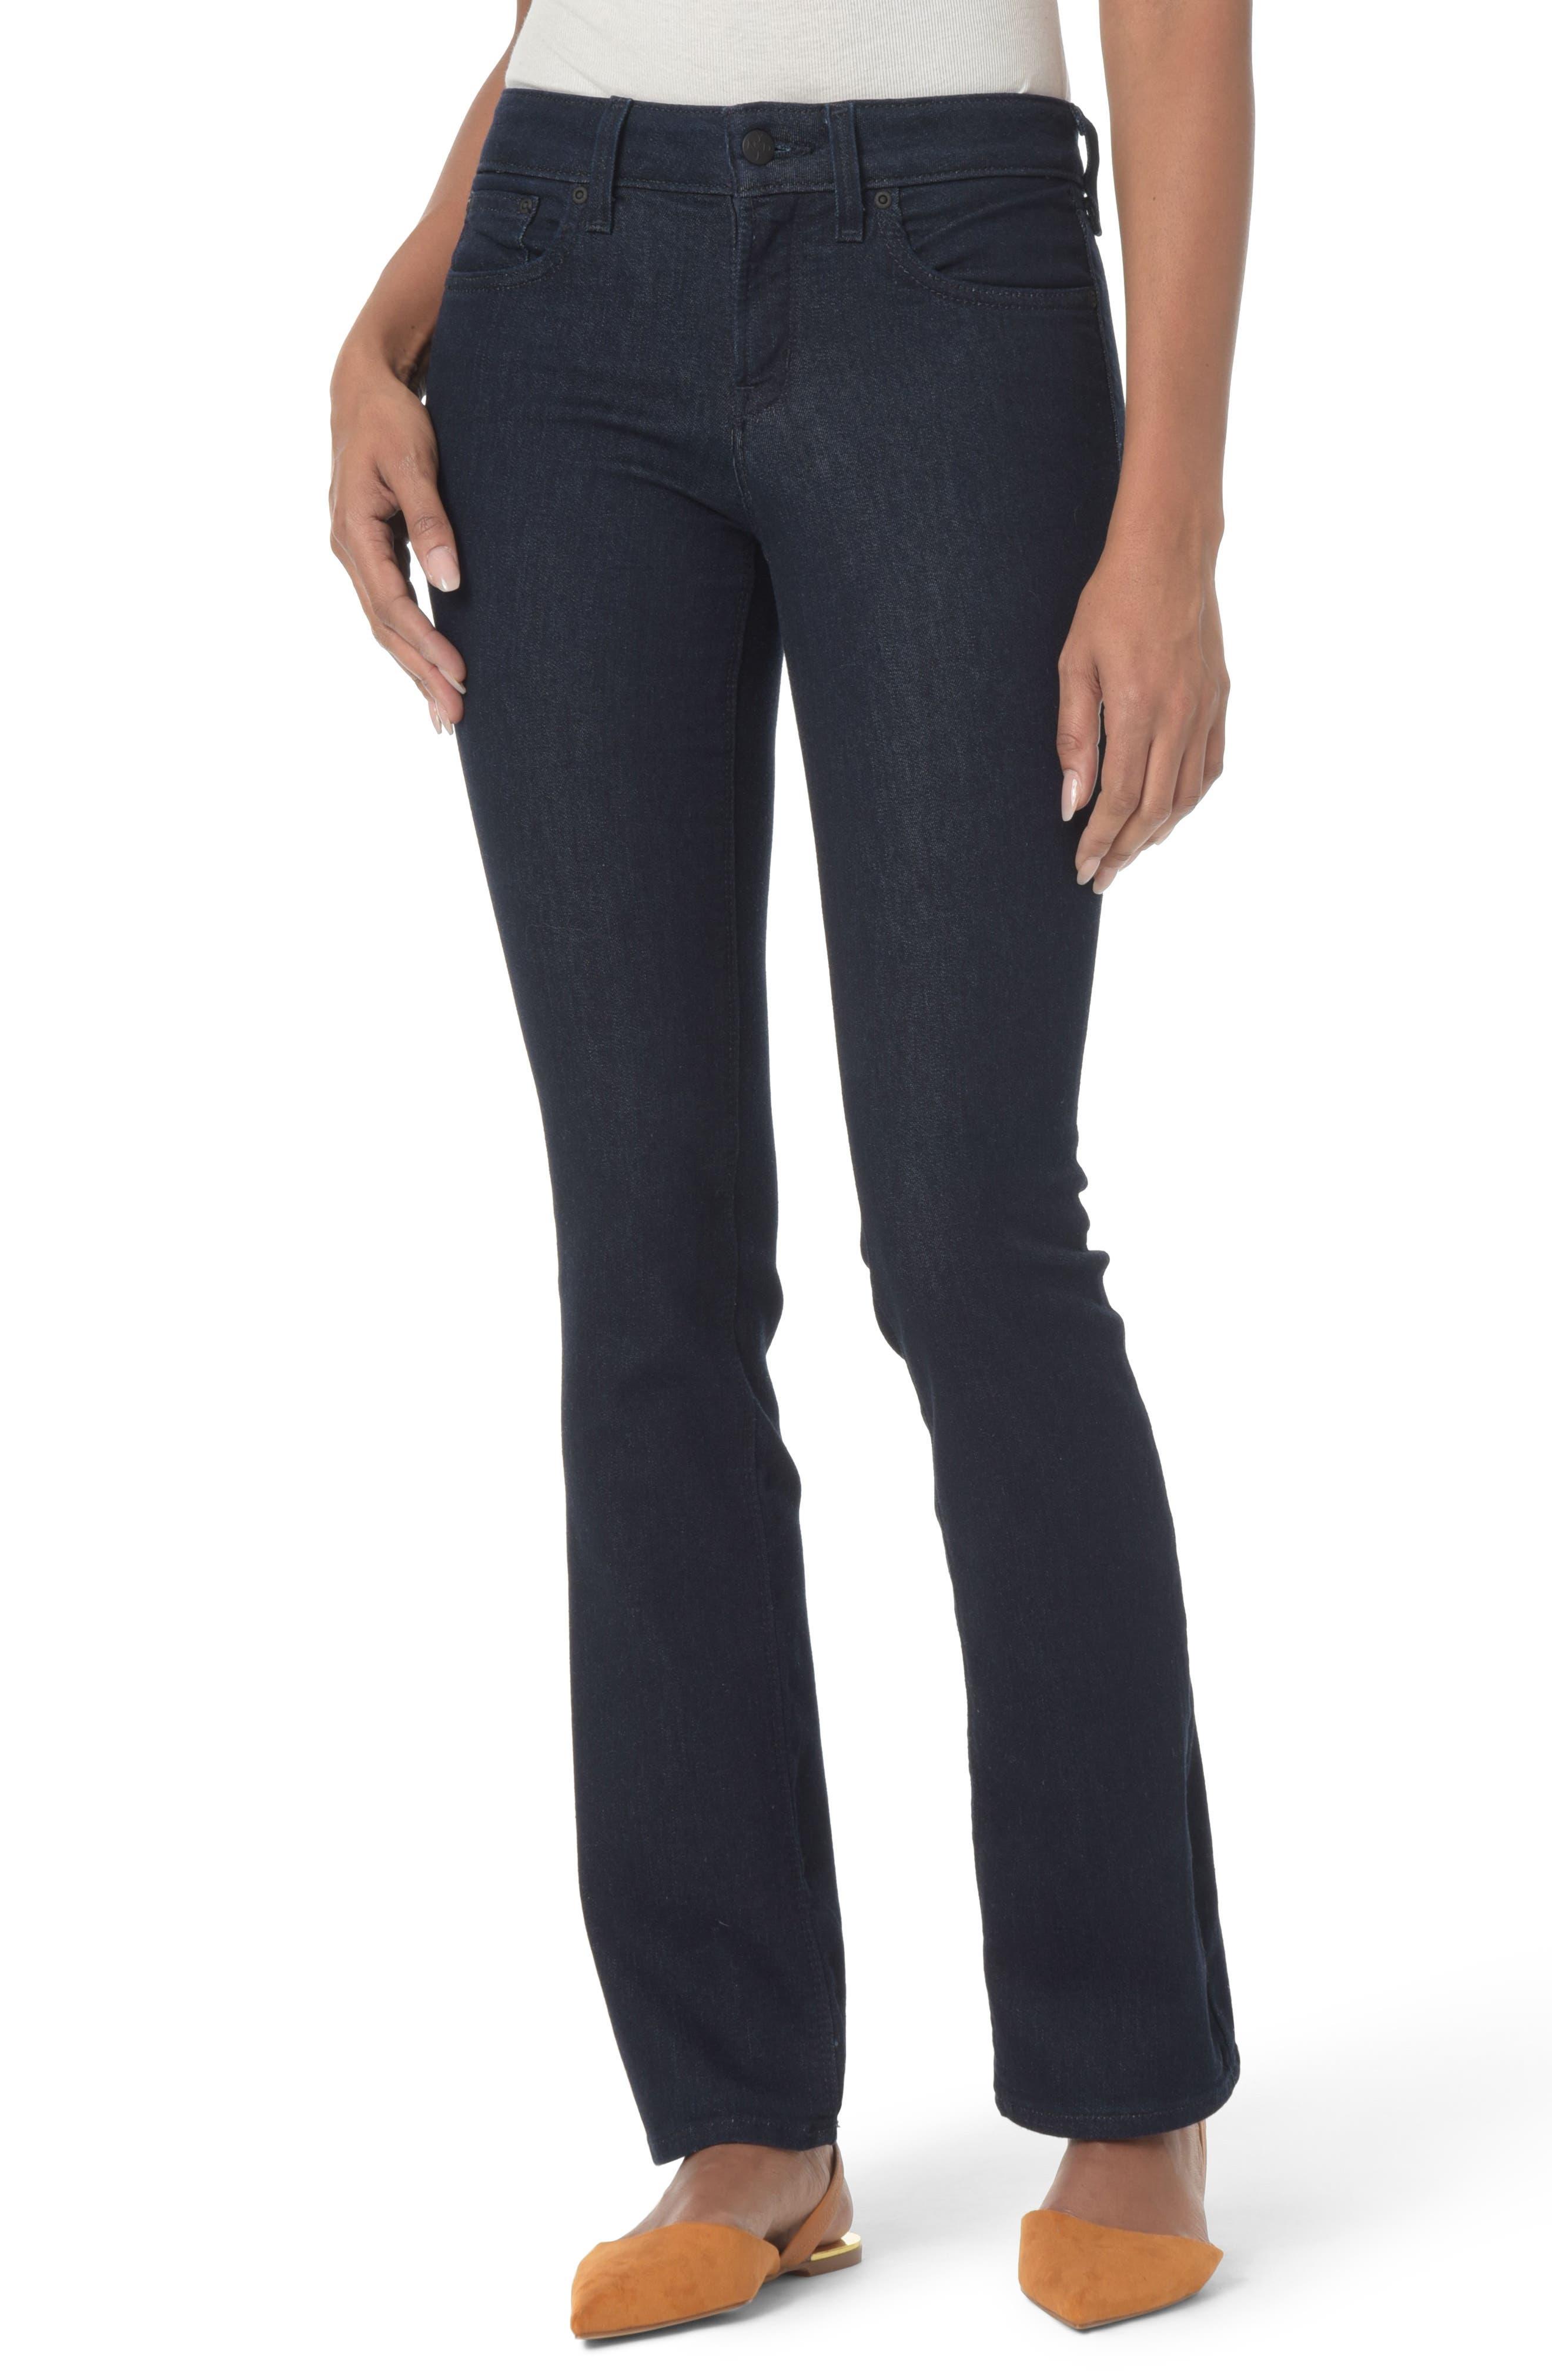 Billie Mini Bootcut Jeans,                         Main,                         color, Rinse